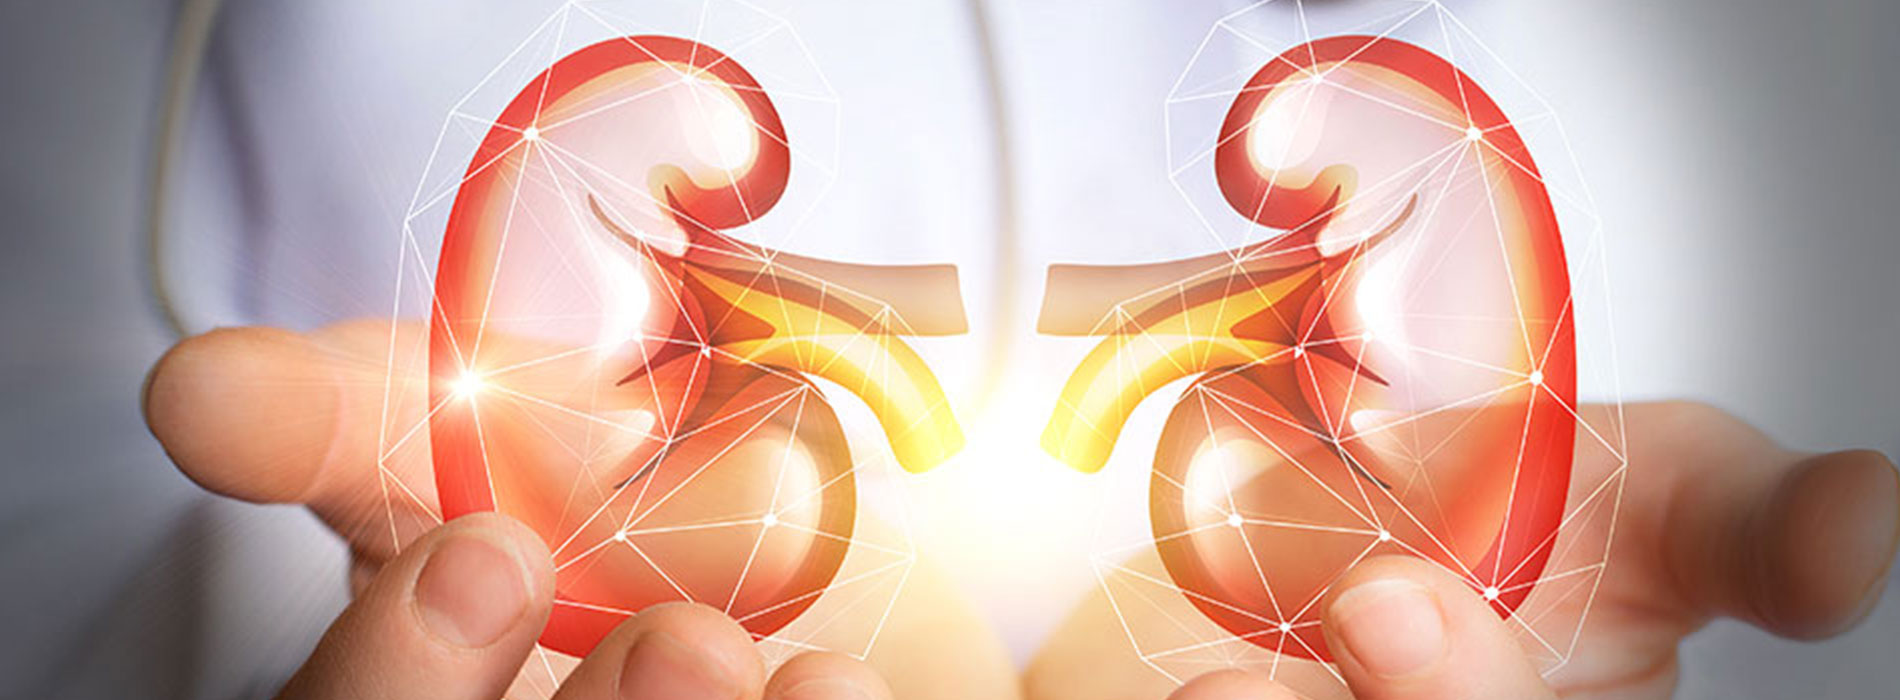 Kidney Failure Stem Cell Treatment Tijuana Cancun